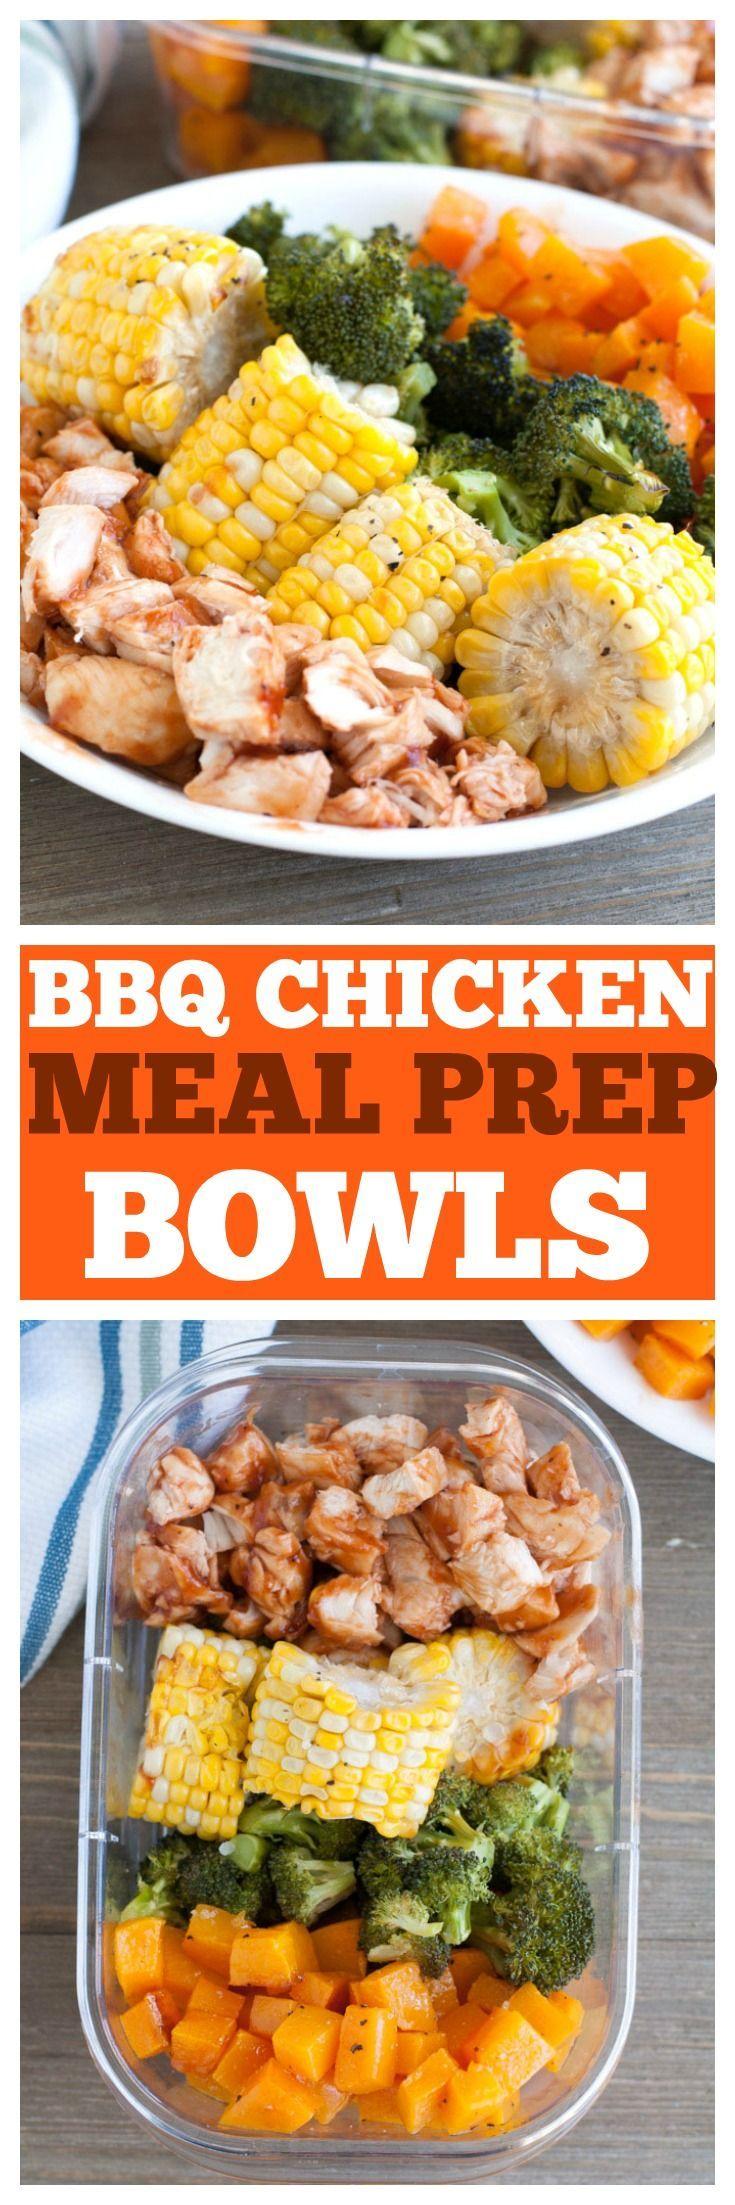 best meal plans images on pinterest healthy eating habits